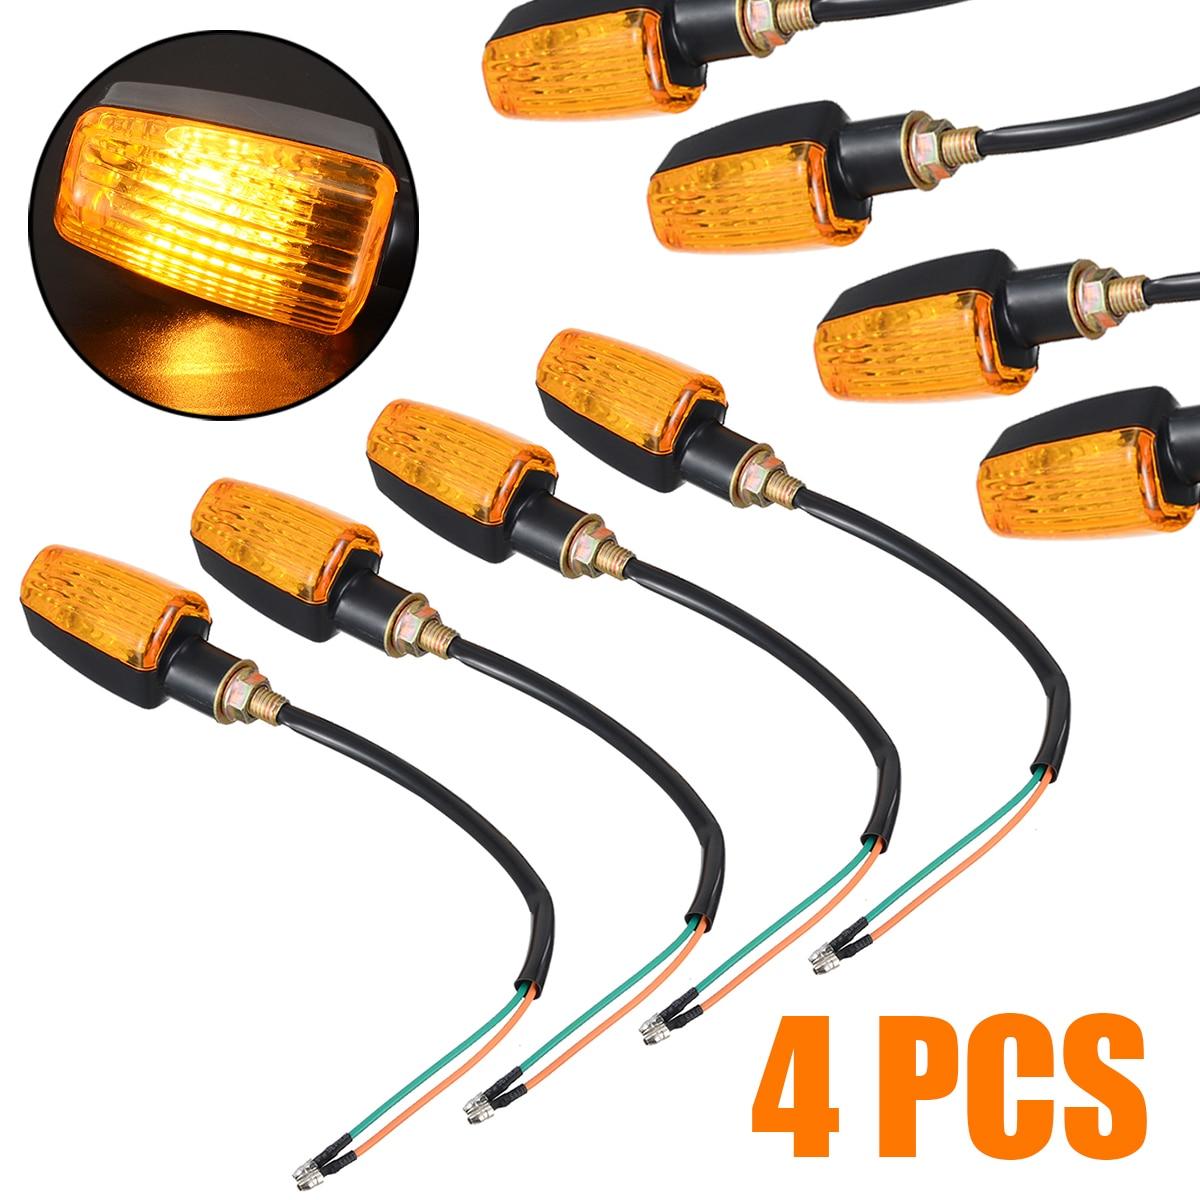 4pcs Universal Motorcycle Turn Signal Universal DC 12V 3W Motorbike Indicator Turning Light Lamp Amber Bulb